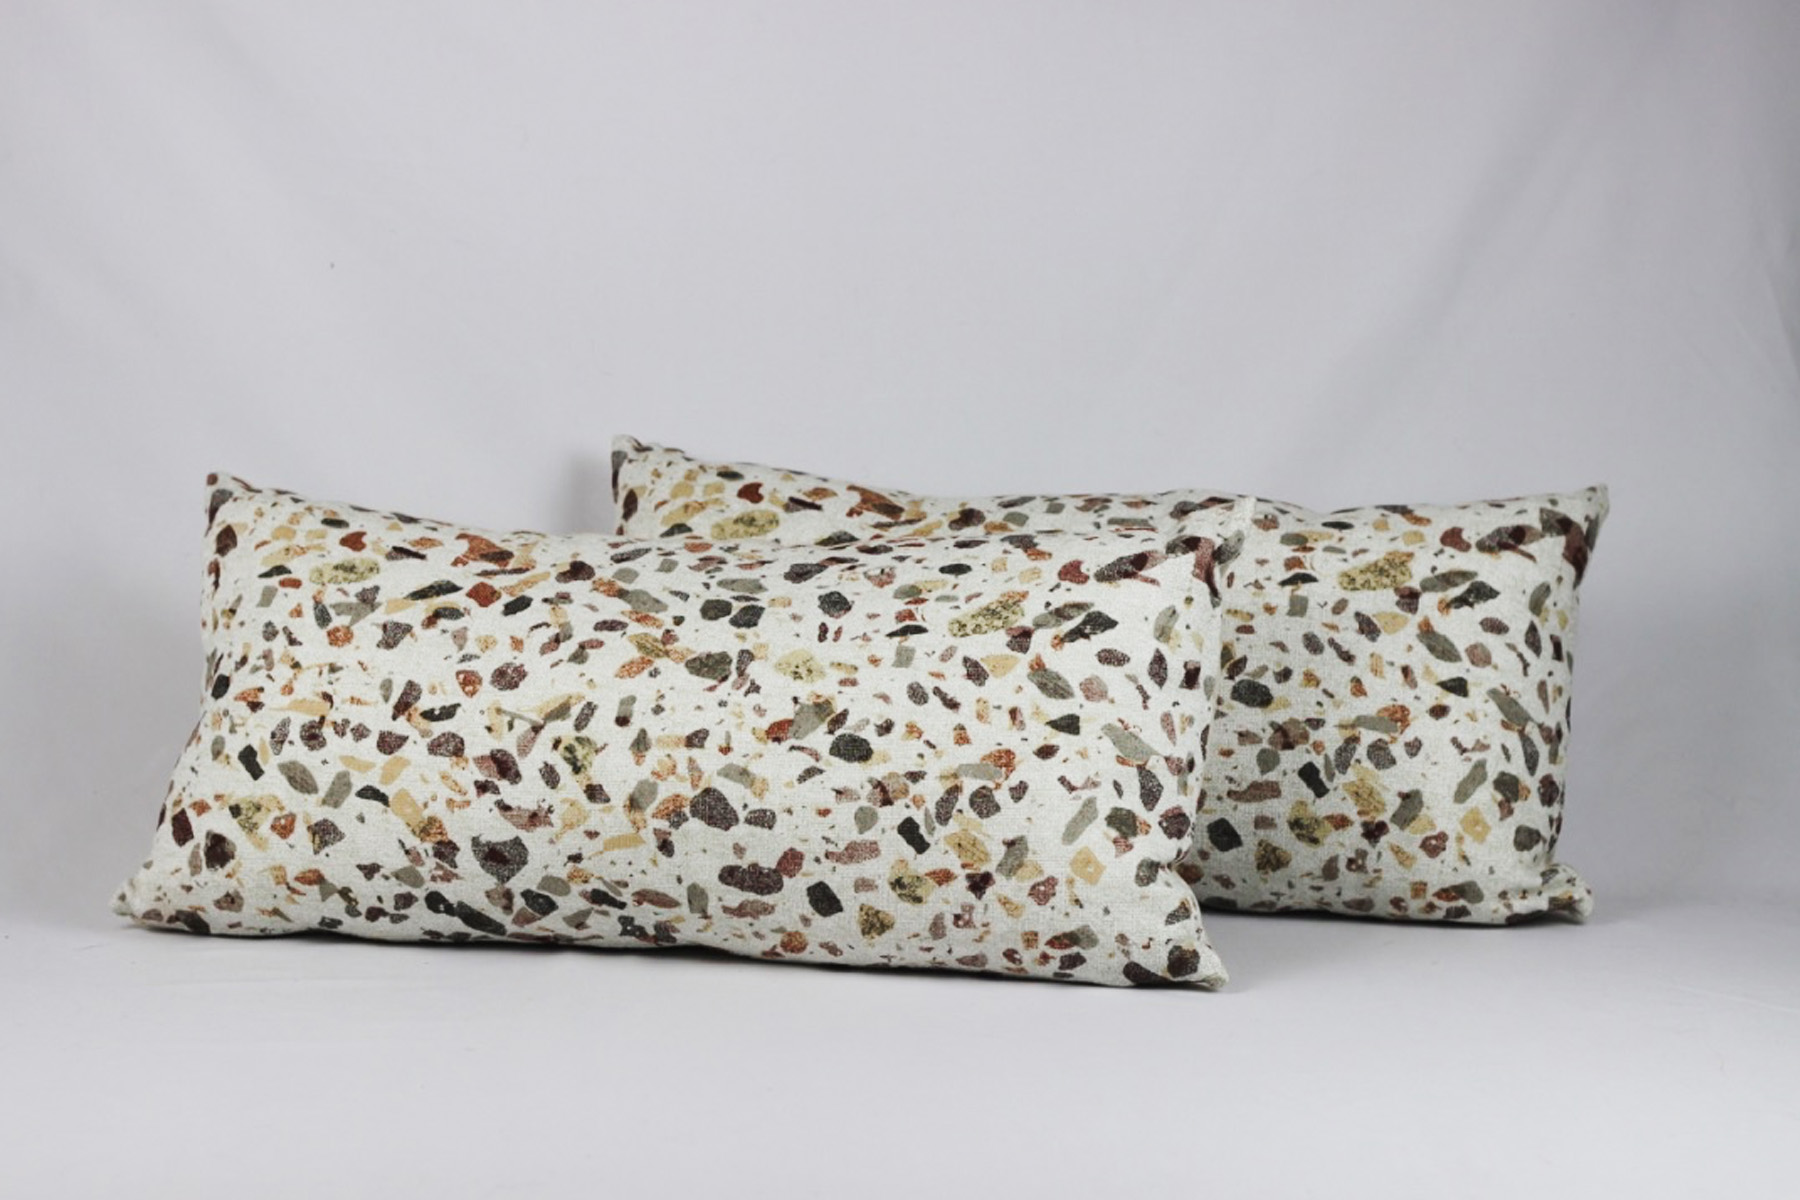 Terrazzo Pillows - Scavenged Vintage Rentals